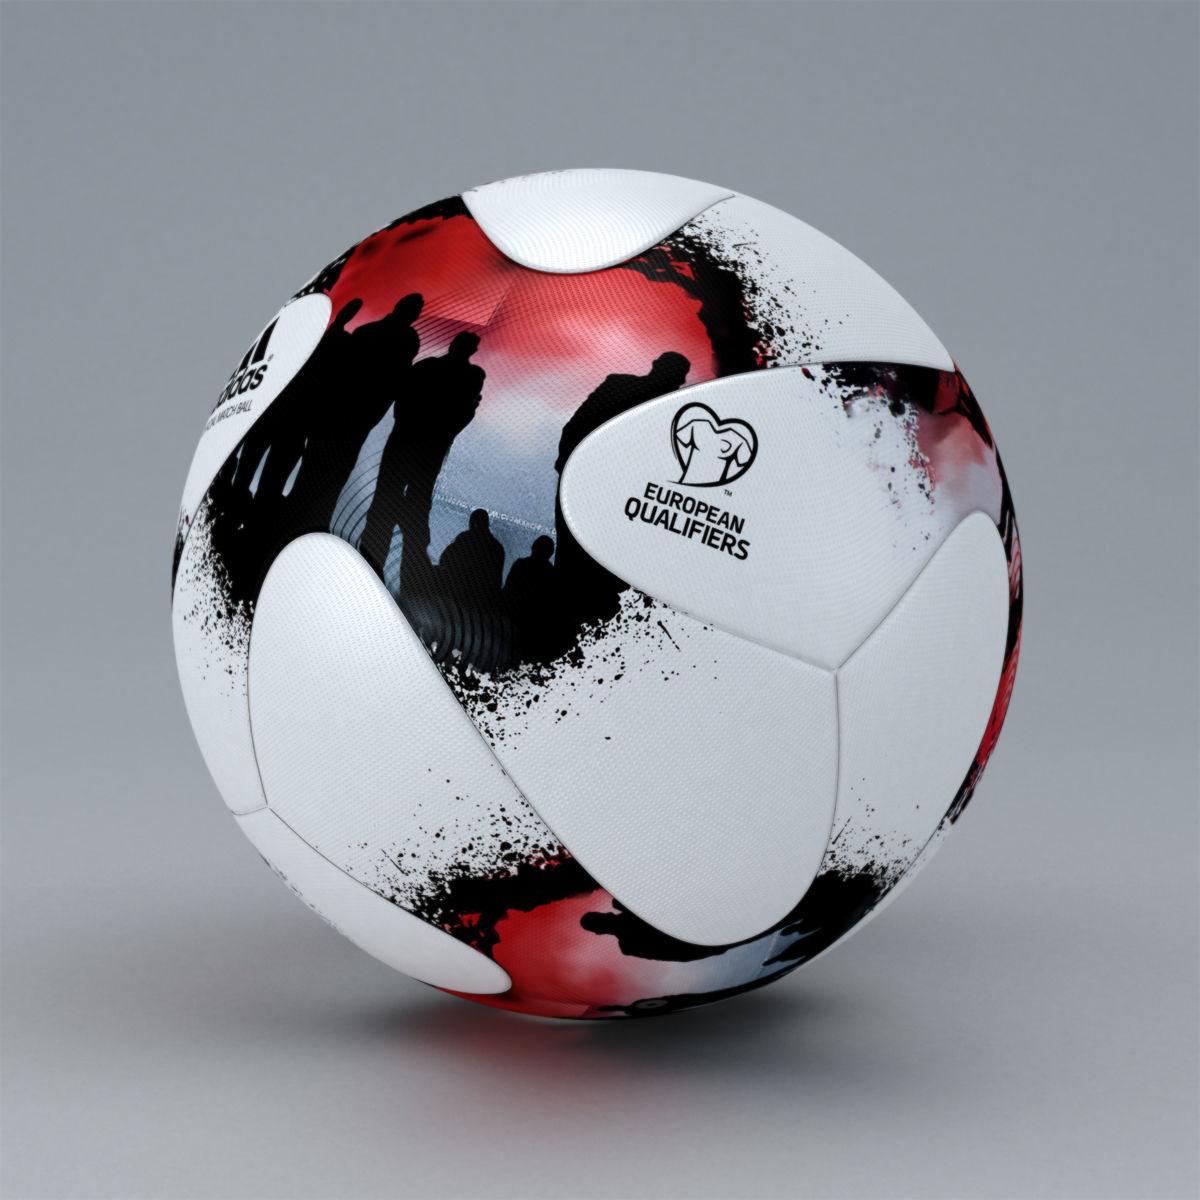 Best Football Ball World Cup 2018 - 2018-fifa-world-cup-qualification-official-match-ball-telstar-3d-model-max-obj-3ds  Collection_314290 .jpg